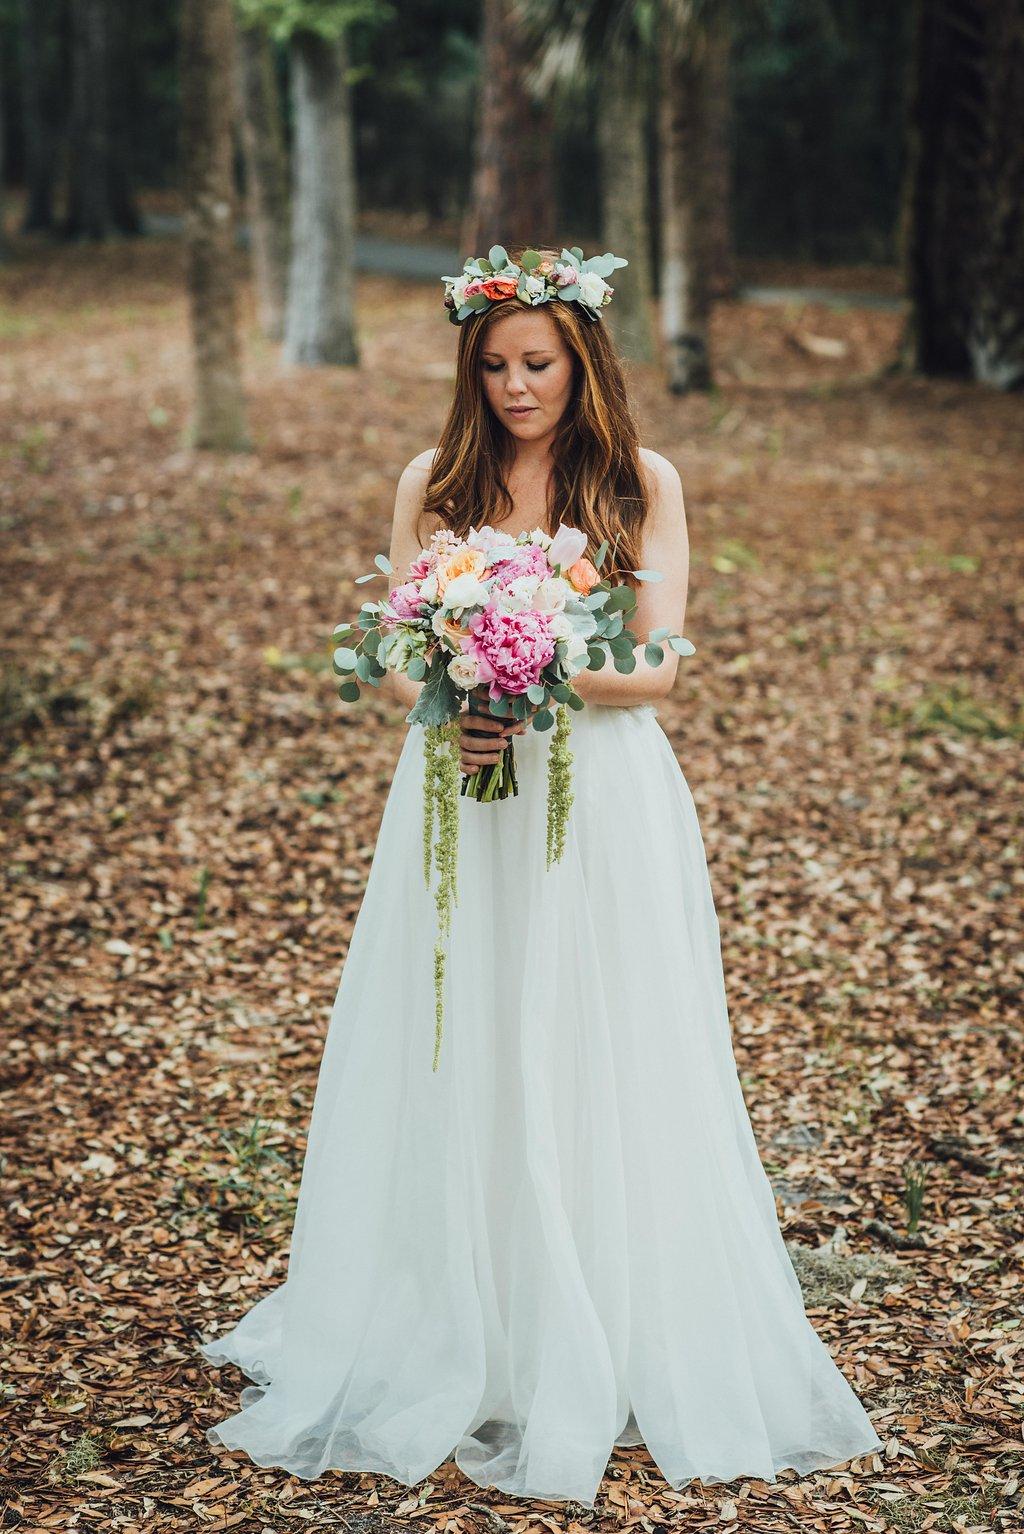 Urban-Poppy-Southern-Wedding-Mallory-and-Justin-photography-ivory-and-beau-bridal-boutique-sarah-seven-marion-boho-bride-indie-bride-indie-wedding-dress-savannah-weddings-hilton-head-weddings-beach-wedding-1.jpg